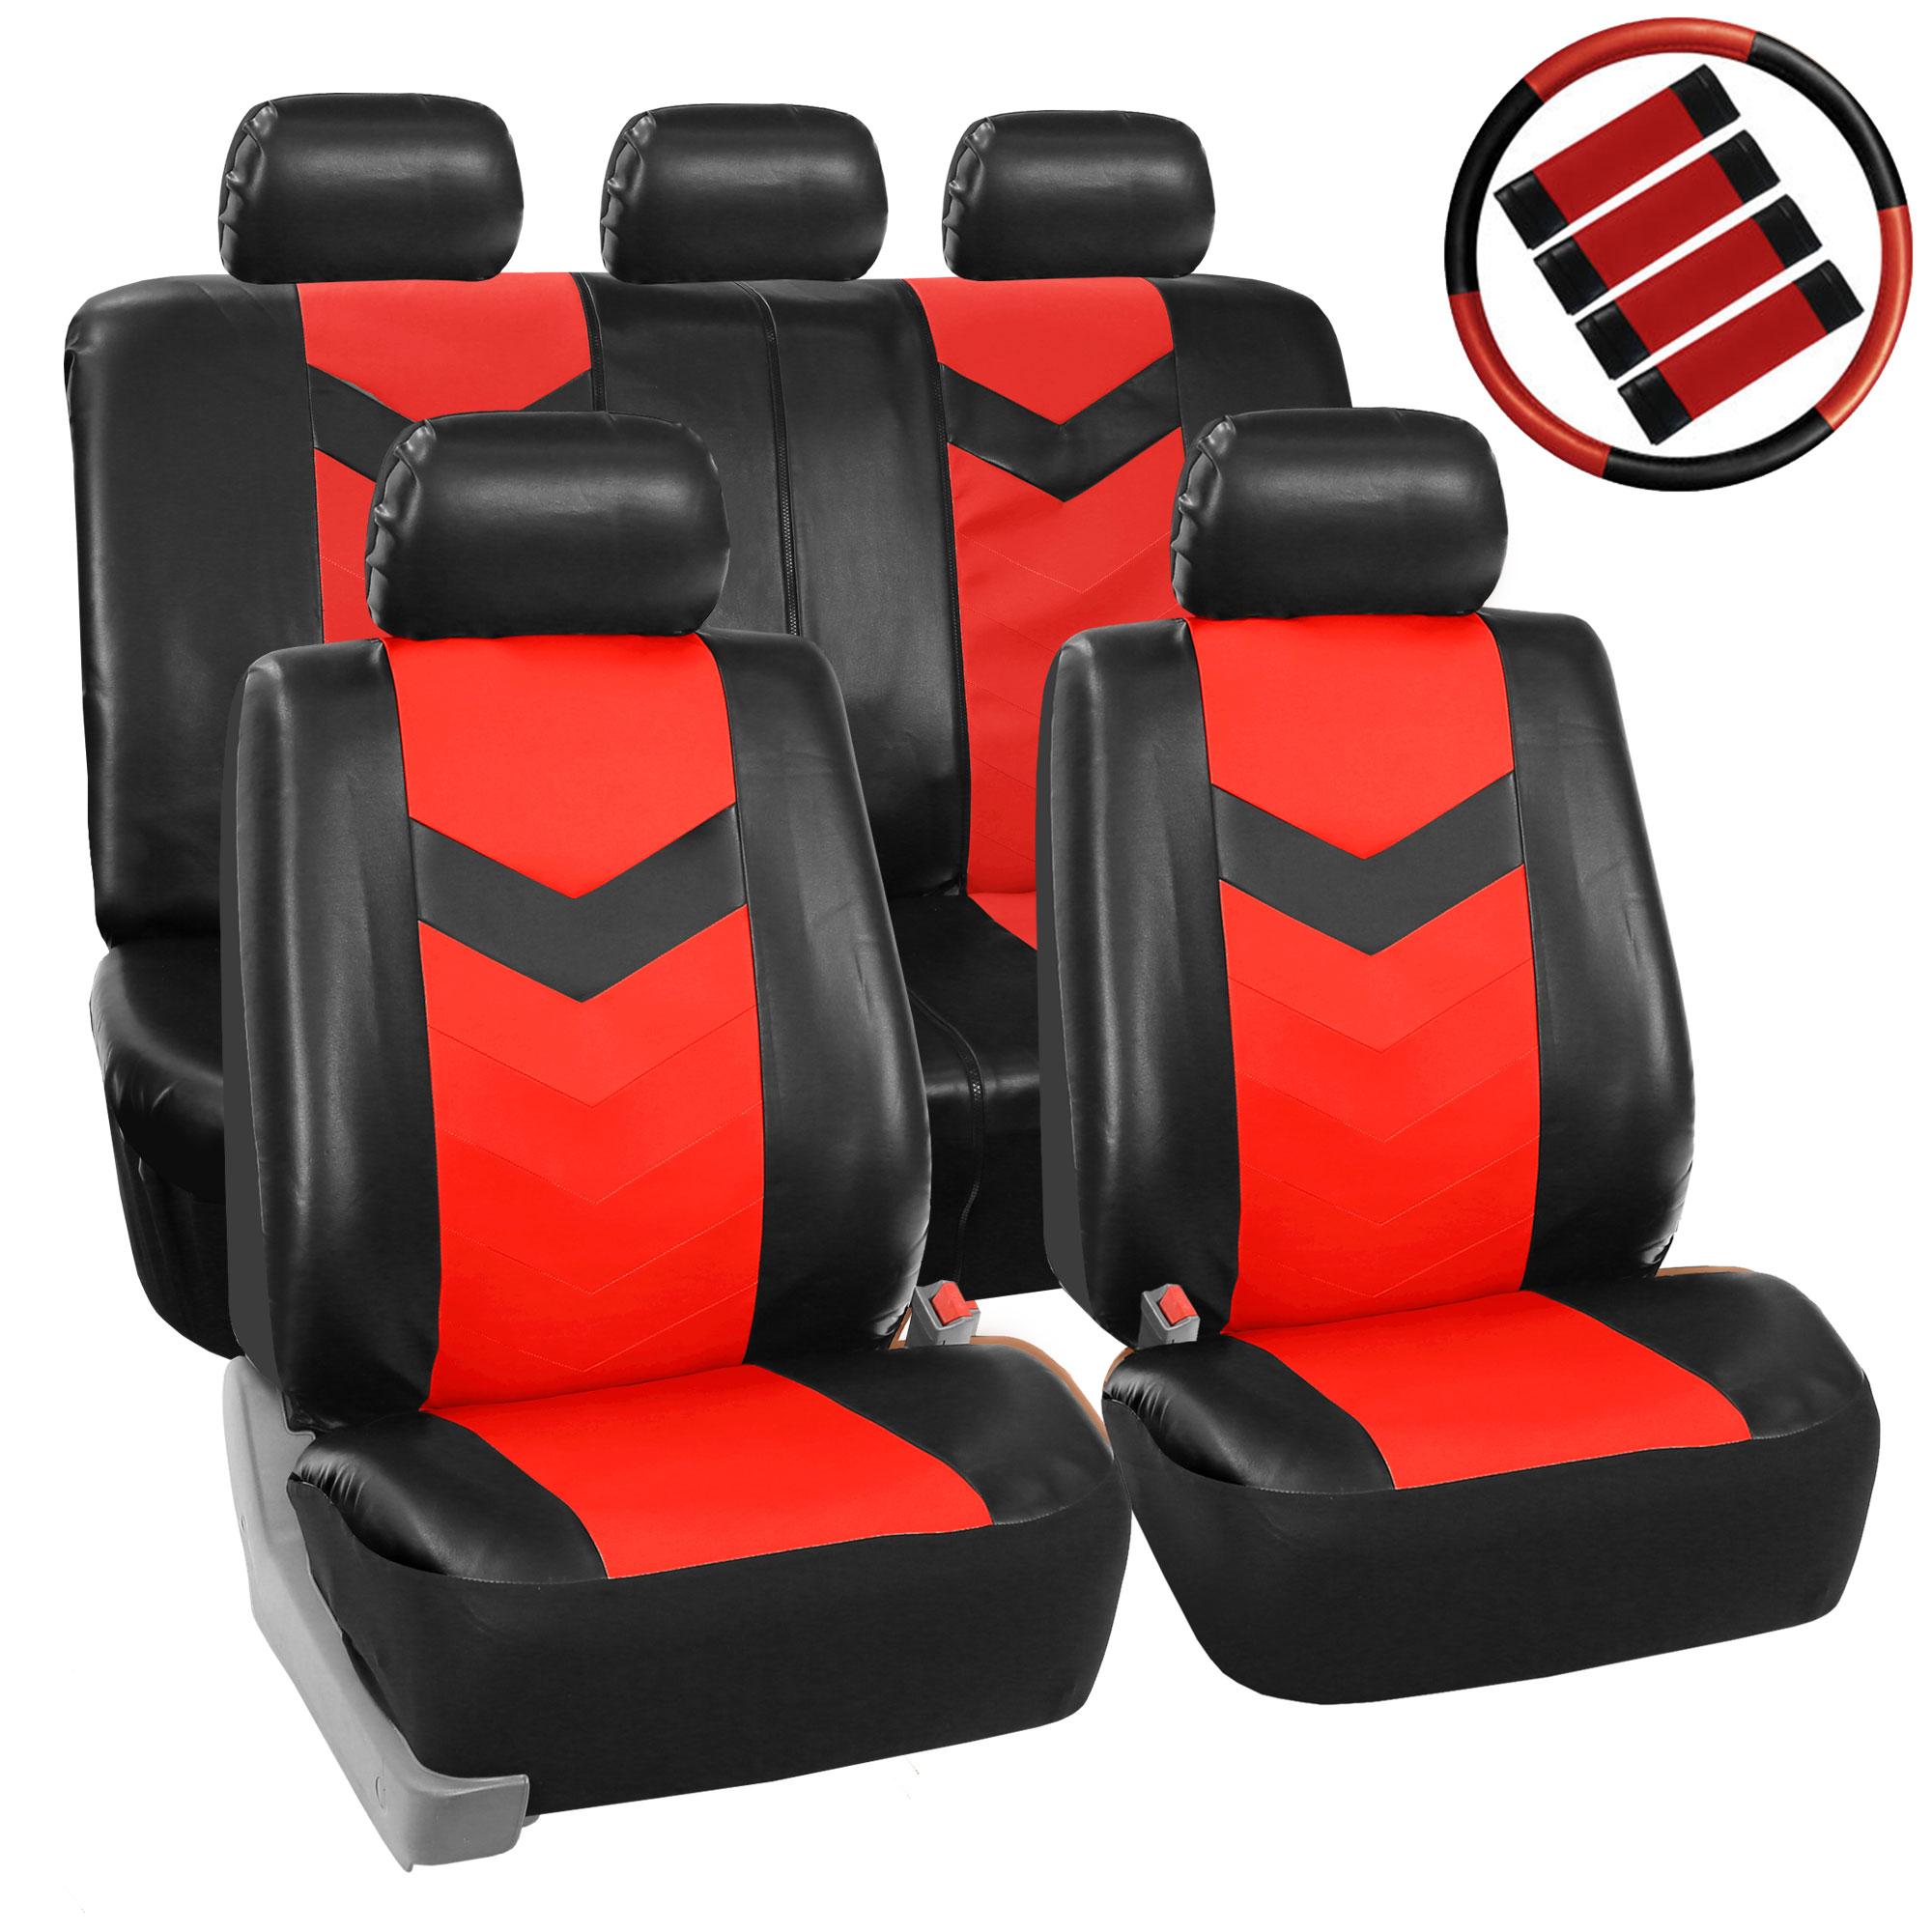 Auto Parts Accessories Seat Covers Split Bench 30pc Solid Black Steering Wheel Belt Headrest For Suvs Shelbysharrison Com